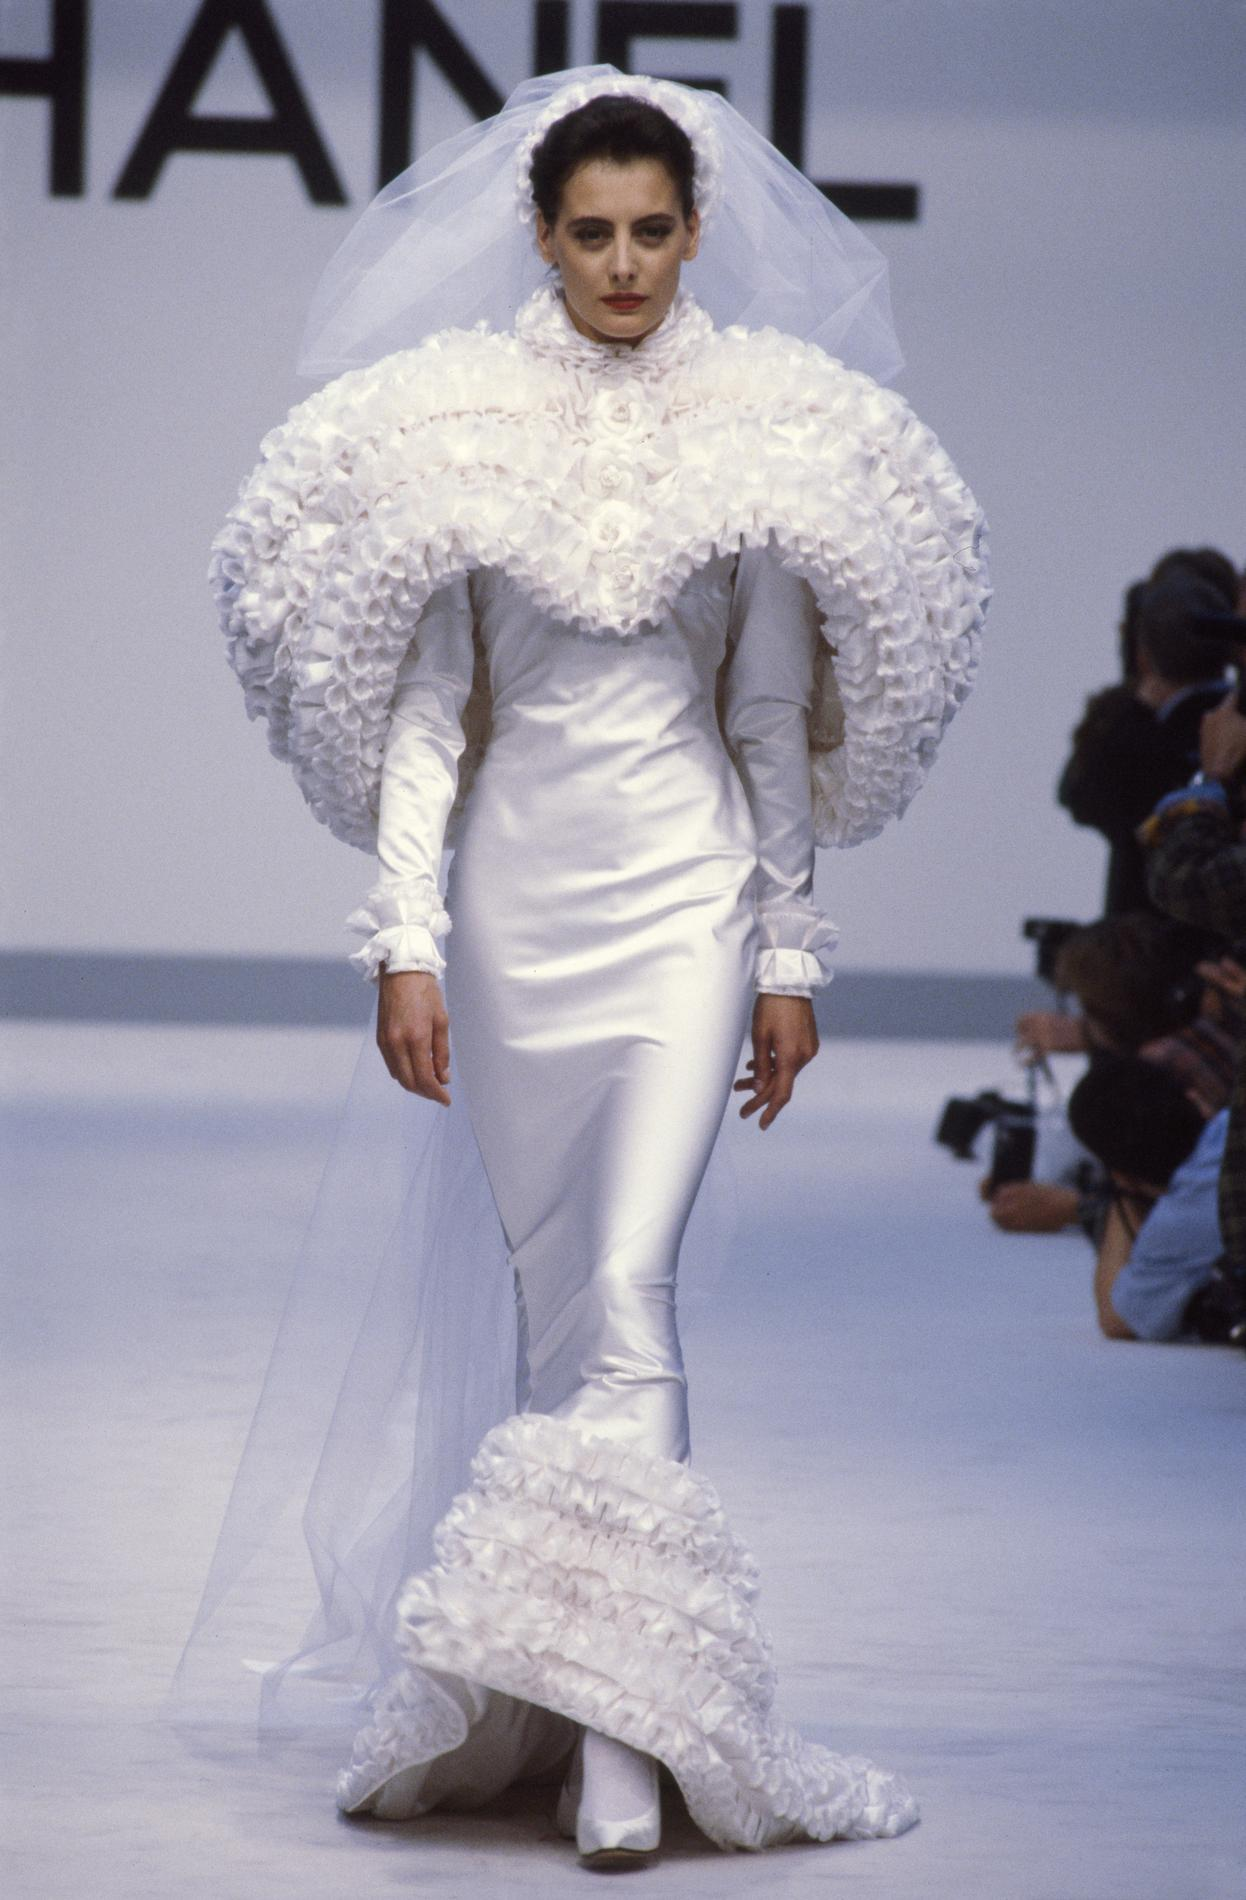 les robes de mari e les plus mythiques de la haute couture madame figaro. Black Bedroom Furniture Sets. Home Design Ideas